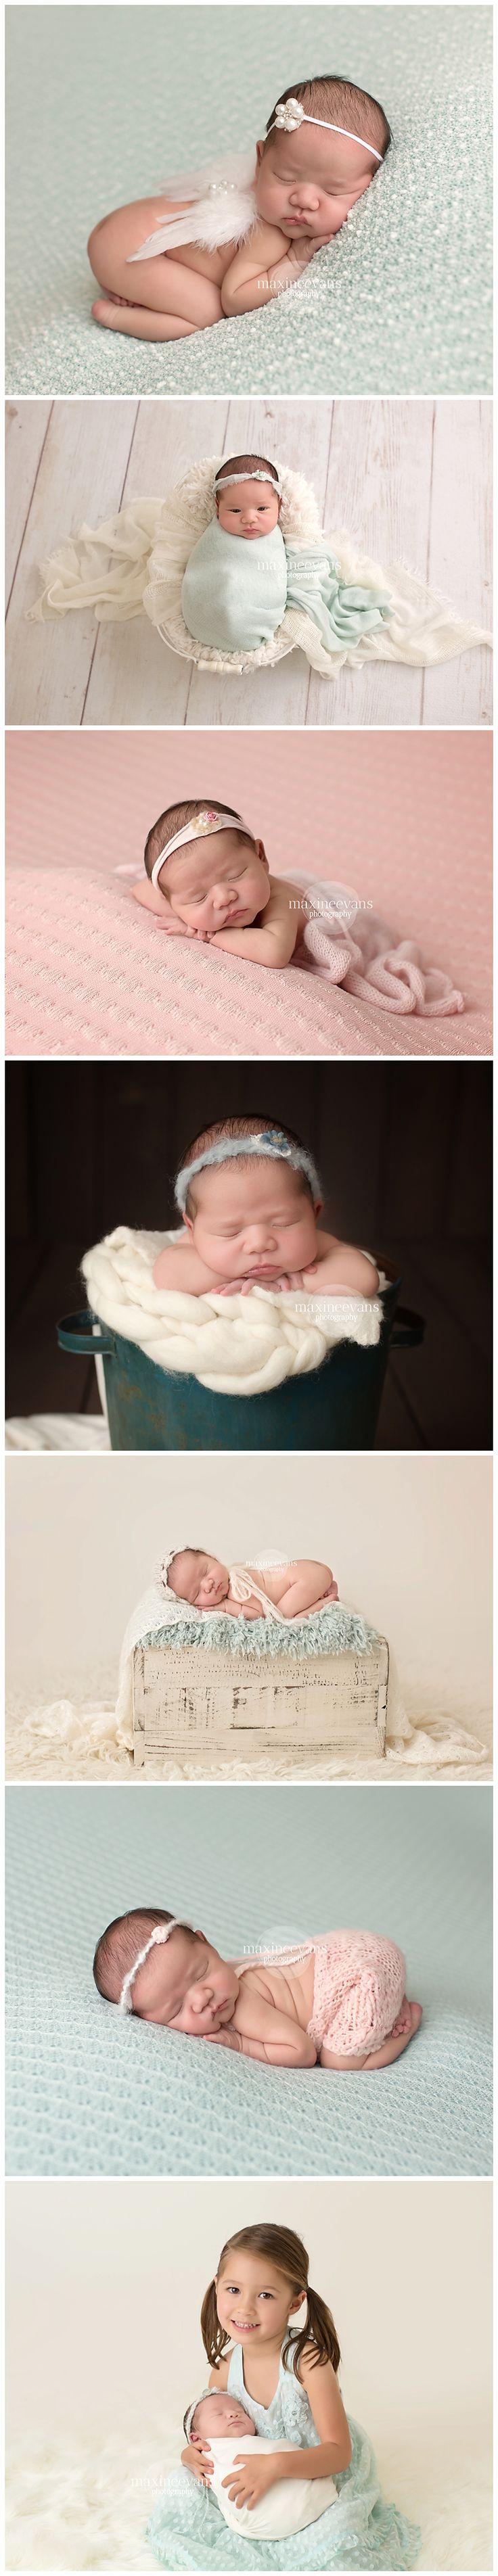 Los Angeles Newborn Photographer - Maxine Evans Photography www.maxineevansphotography.com Celebrity Baby Photography